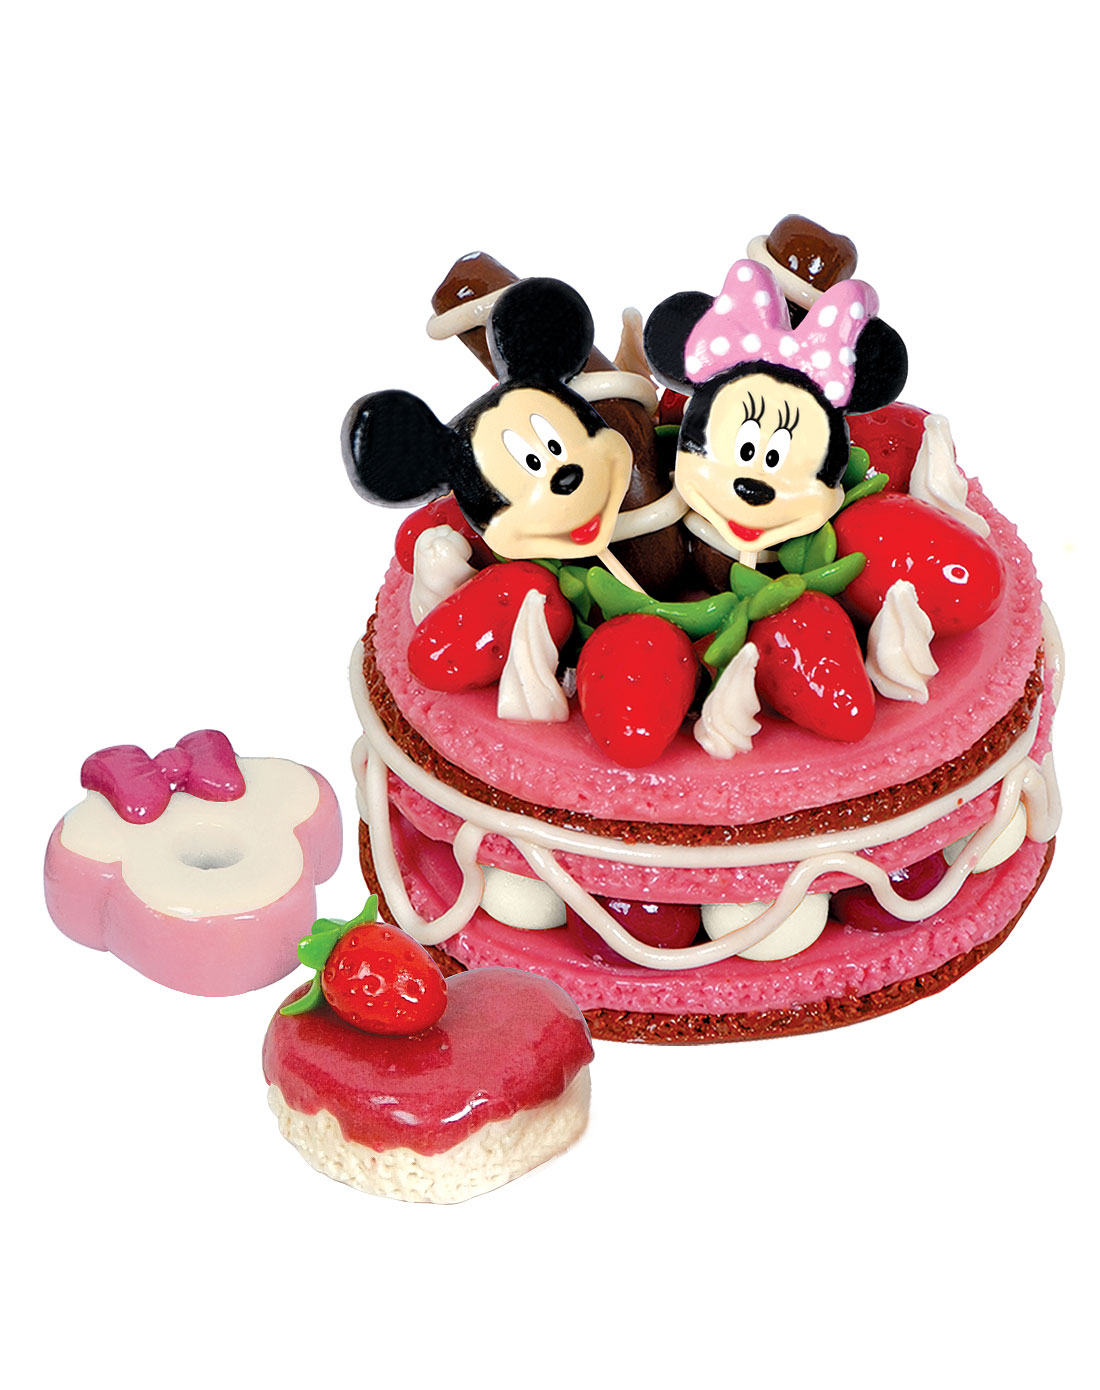 可爱小蛋糕ds-1646